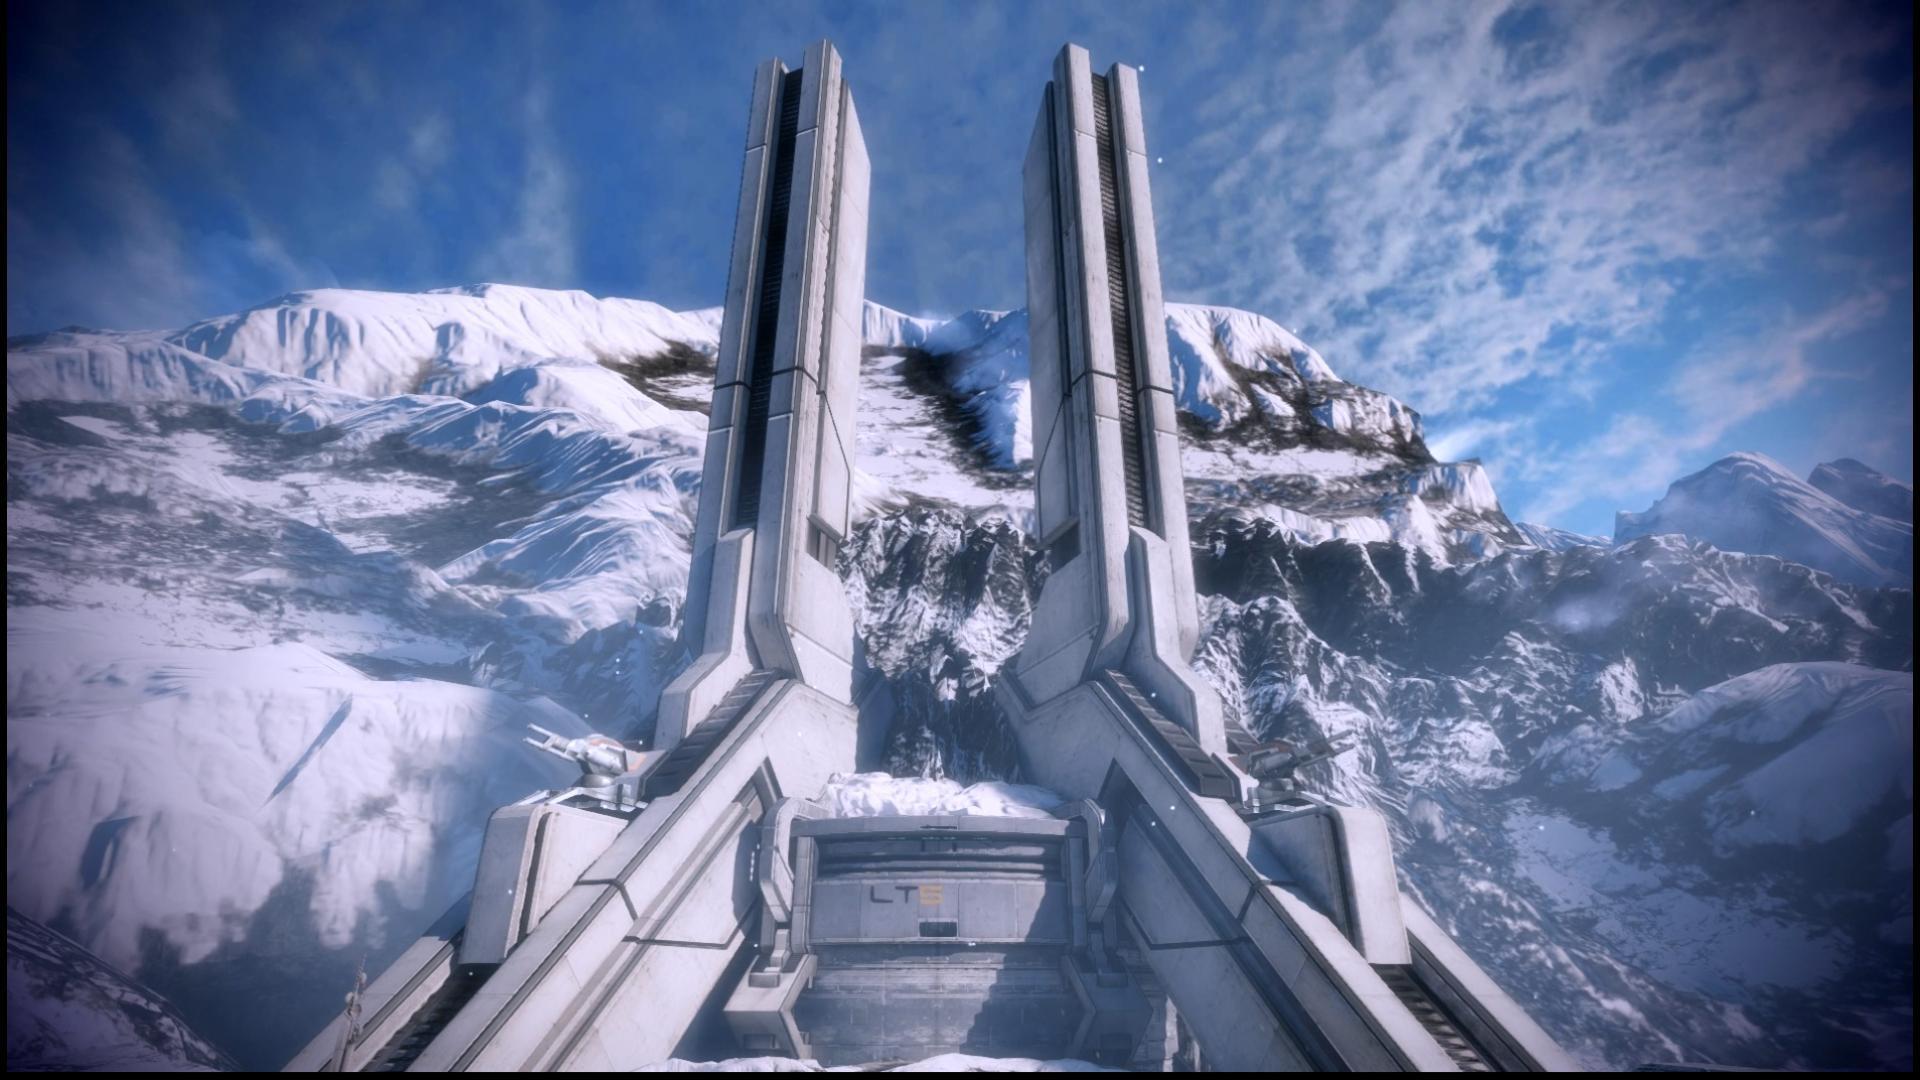 Mass Effect 3 Gellix Dreamscene by droot1986